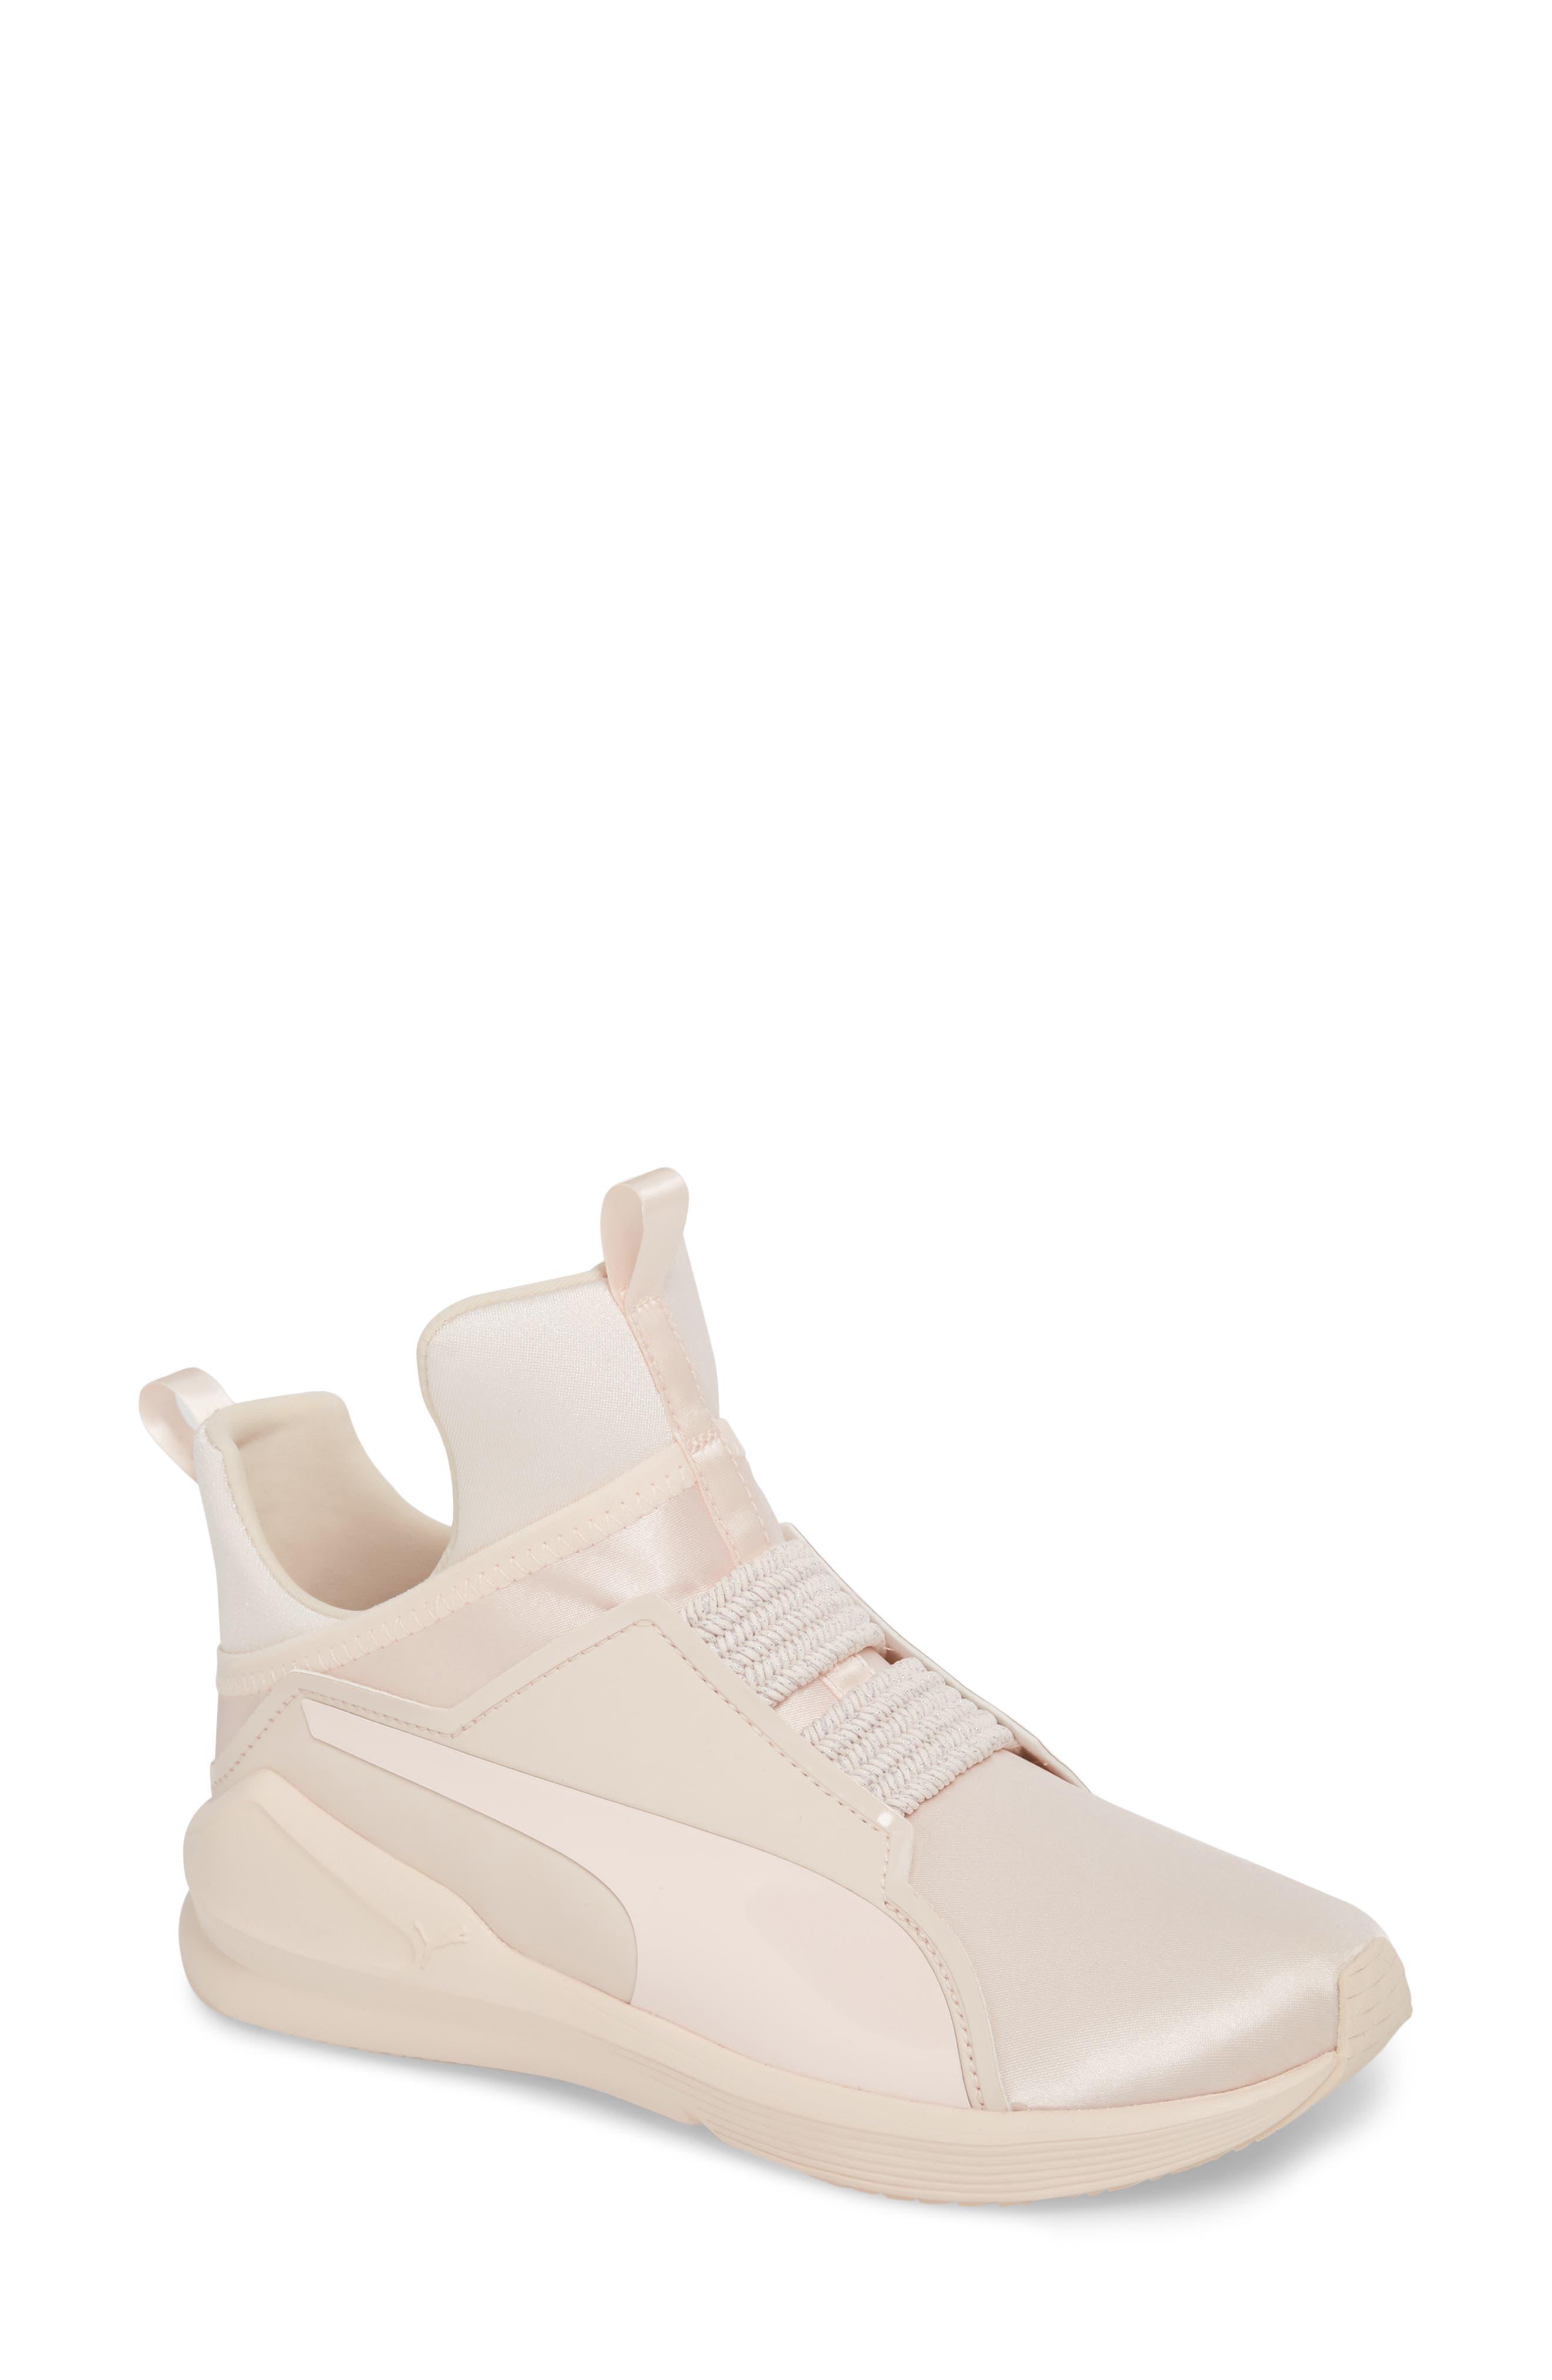 Fierce Satin EP Training Shoe,                         Main,                         color, Pearl